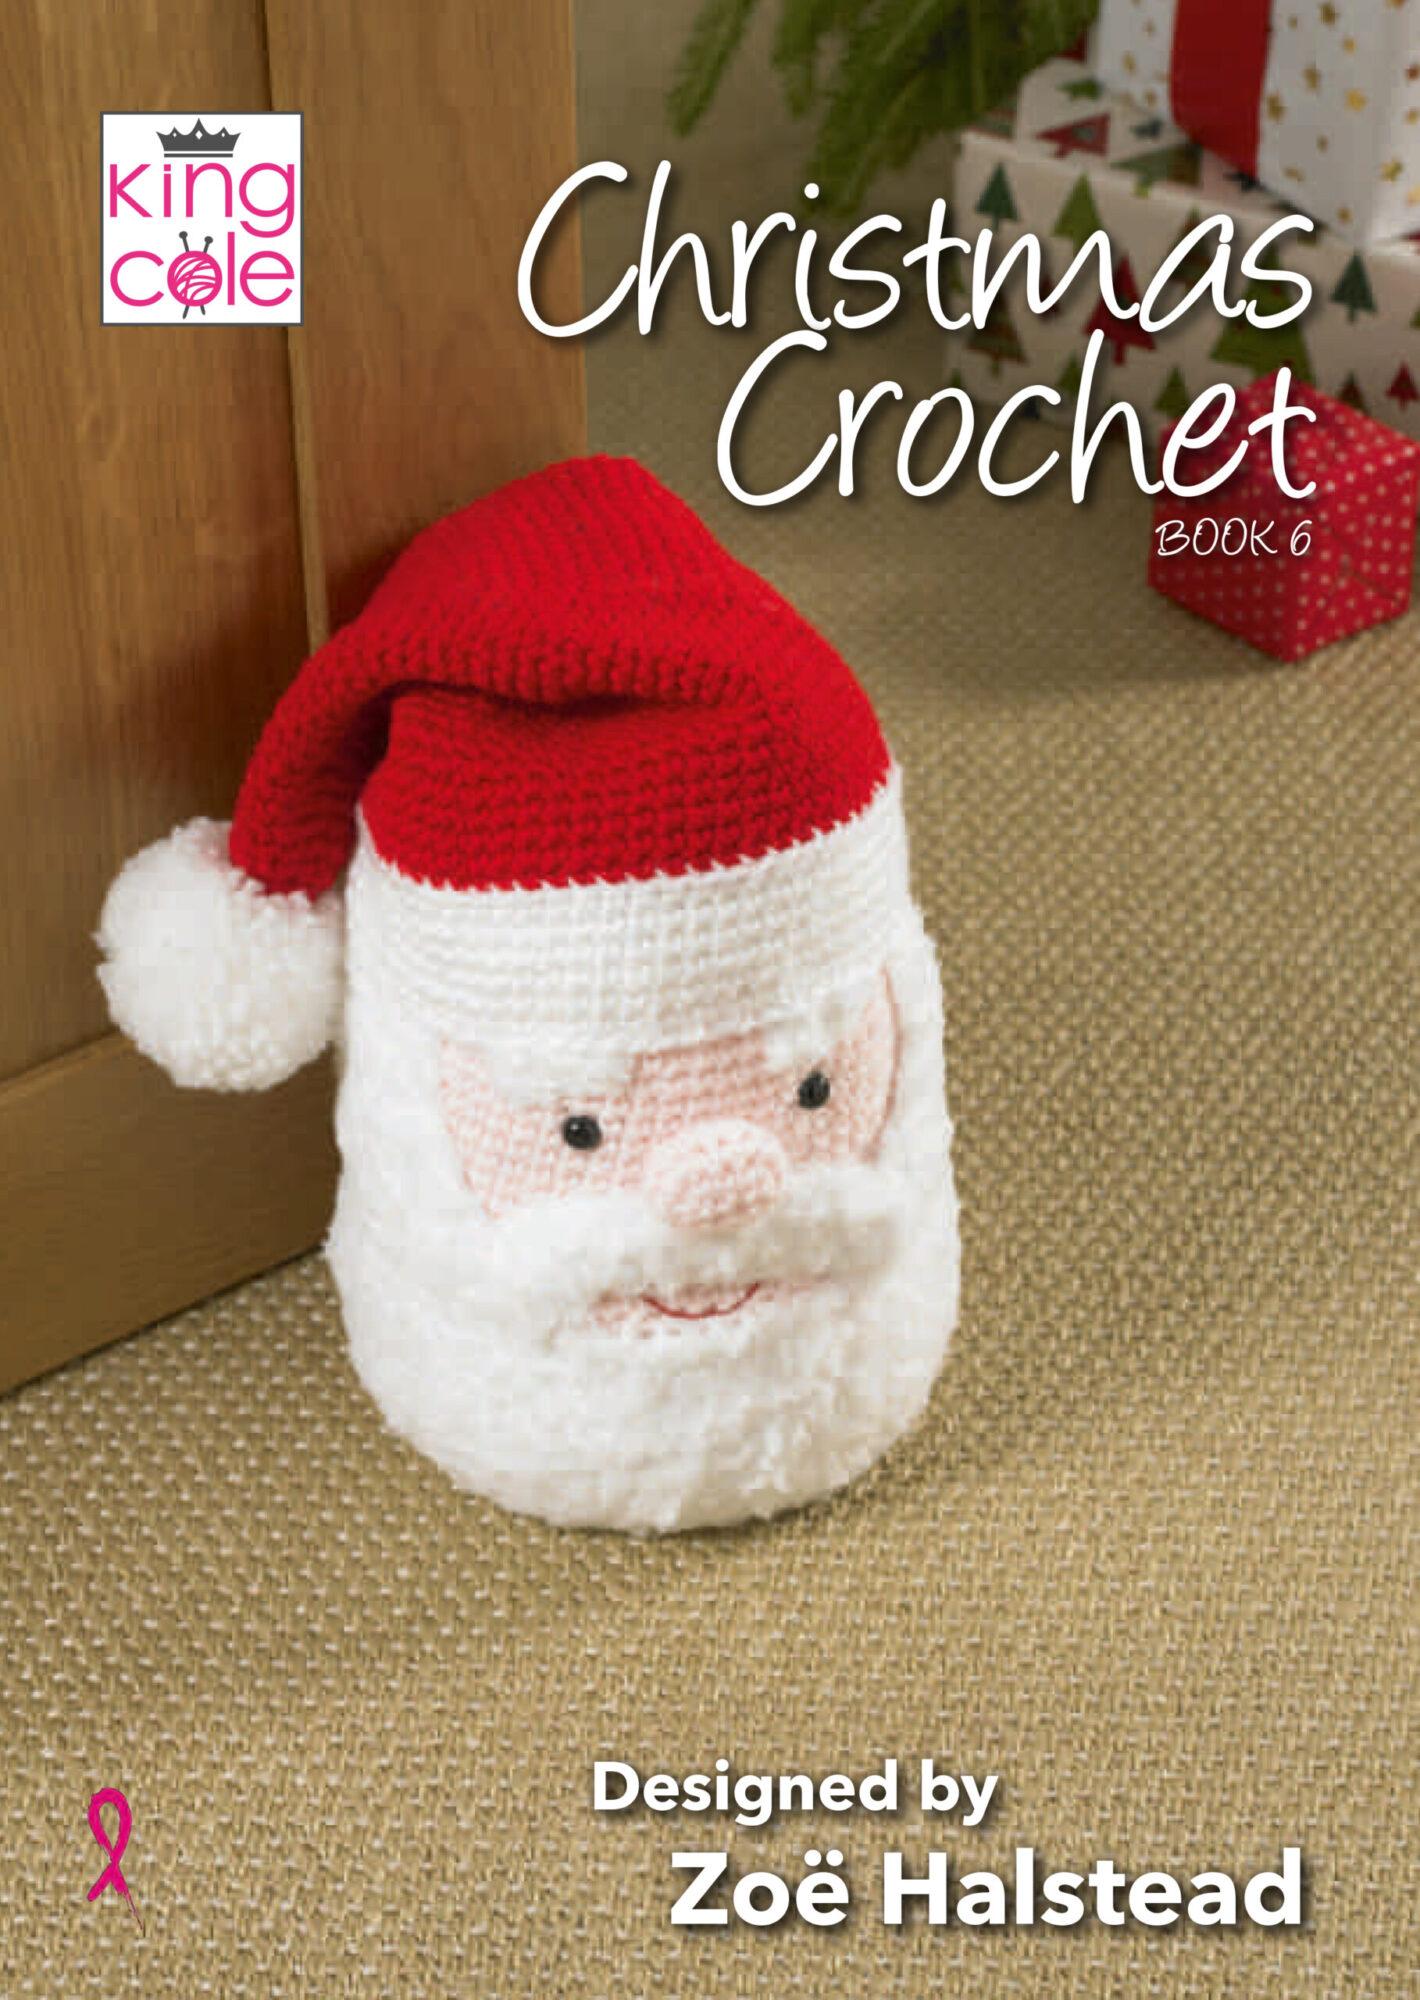 King Cole Christmas Crochet – Book 6 product image